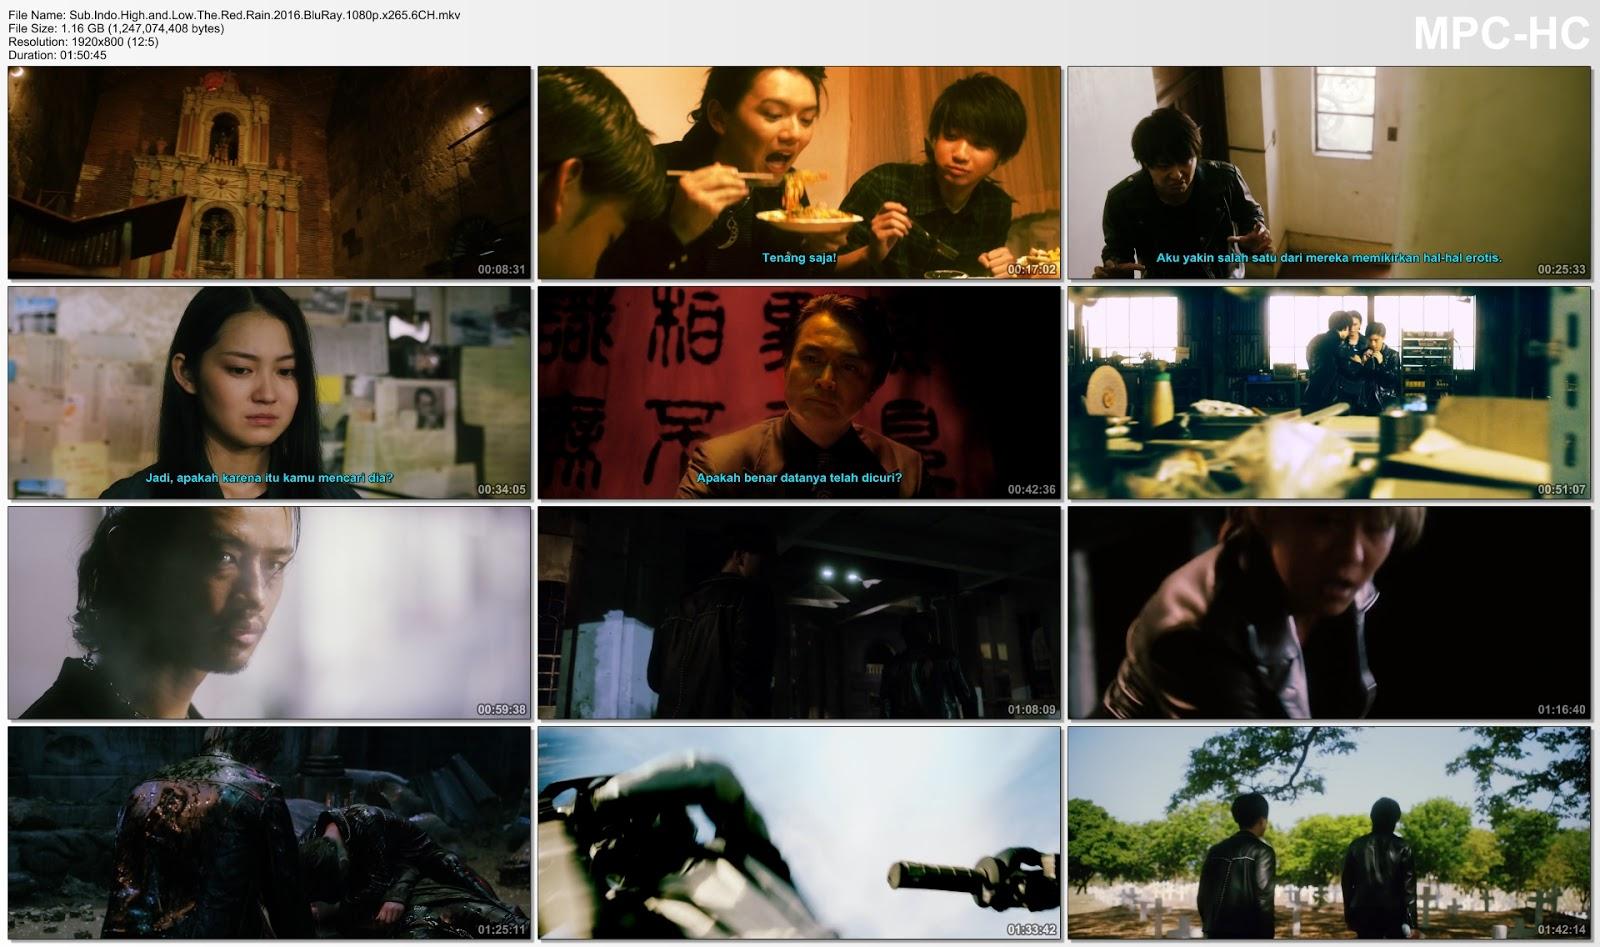 Screenshots Download Film Gratis High & Low the Red Rain (2016) BluRay 1080p X265 HEVC 6CH Subtitle Indonesia MKV Nonton Film Gratis Free Full Movie Streaming